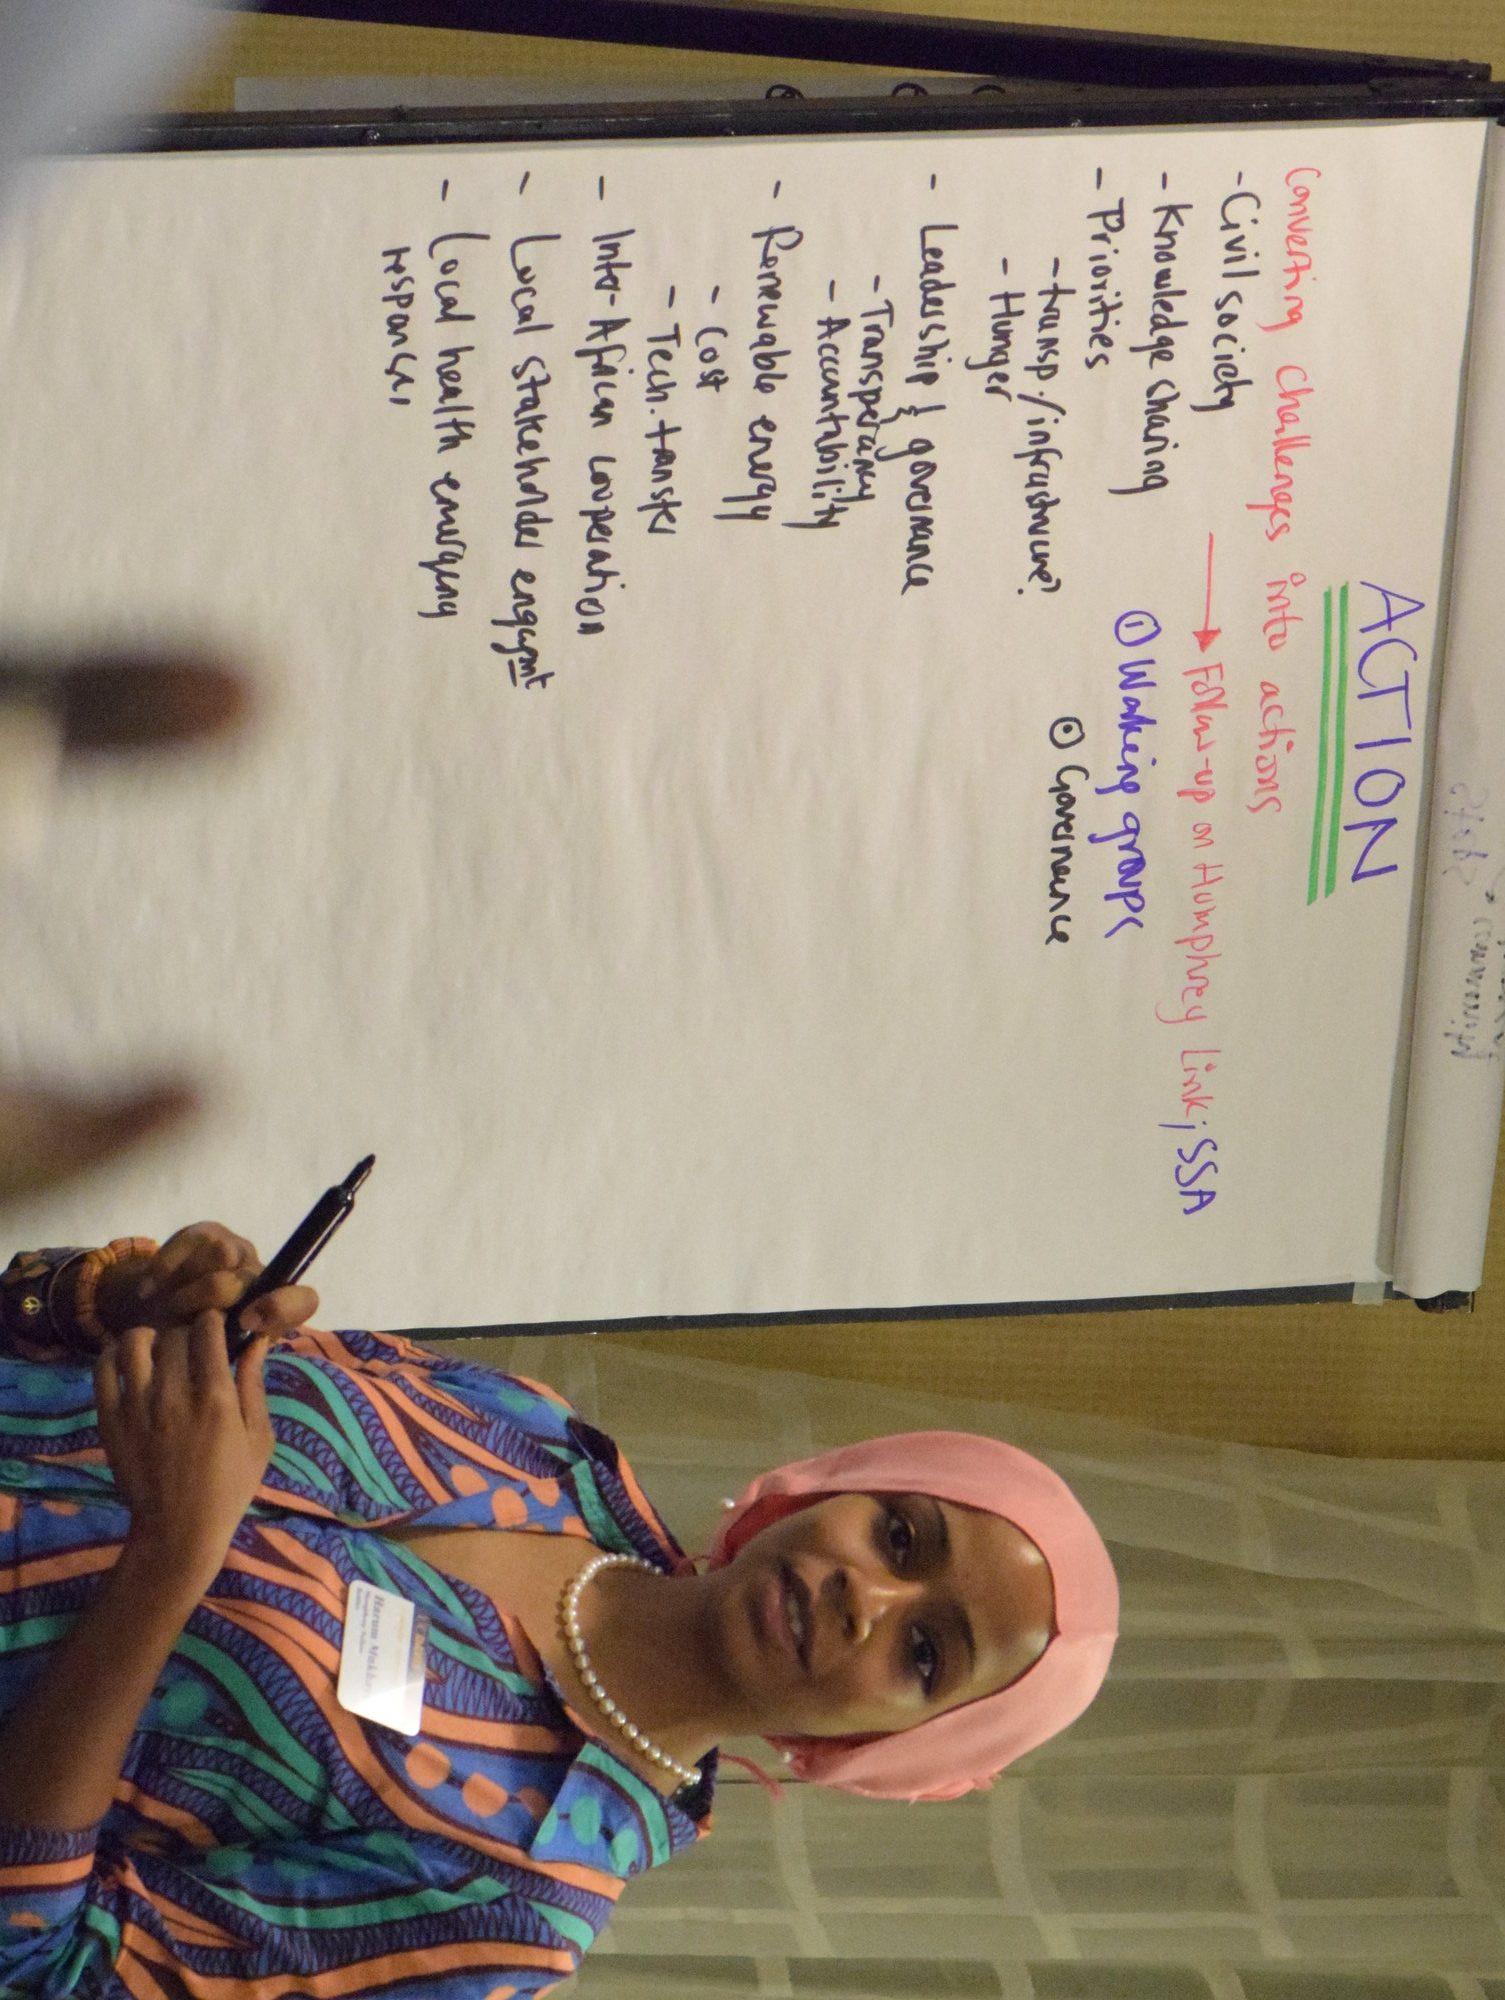 International civil servant, global nomad & policy activist